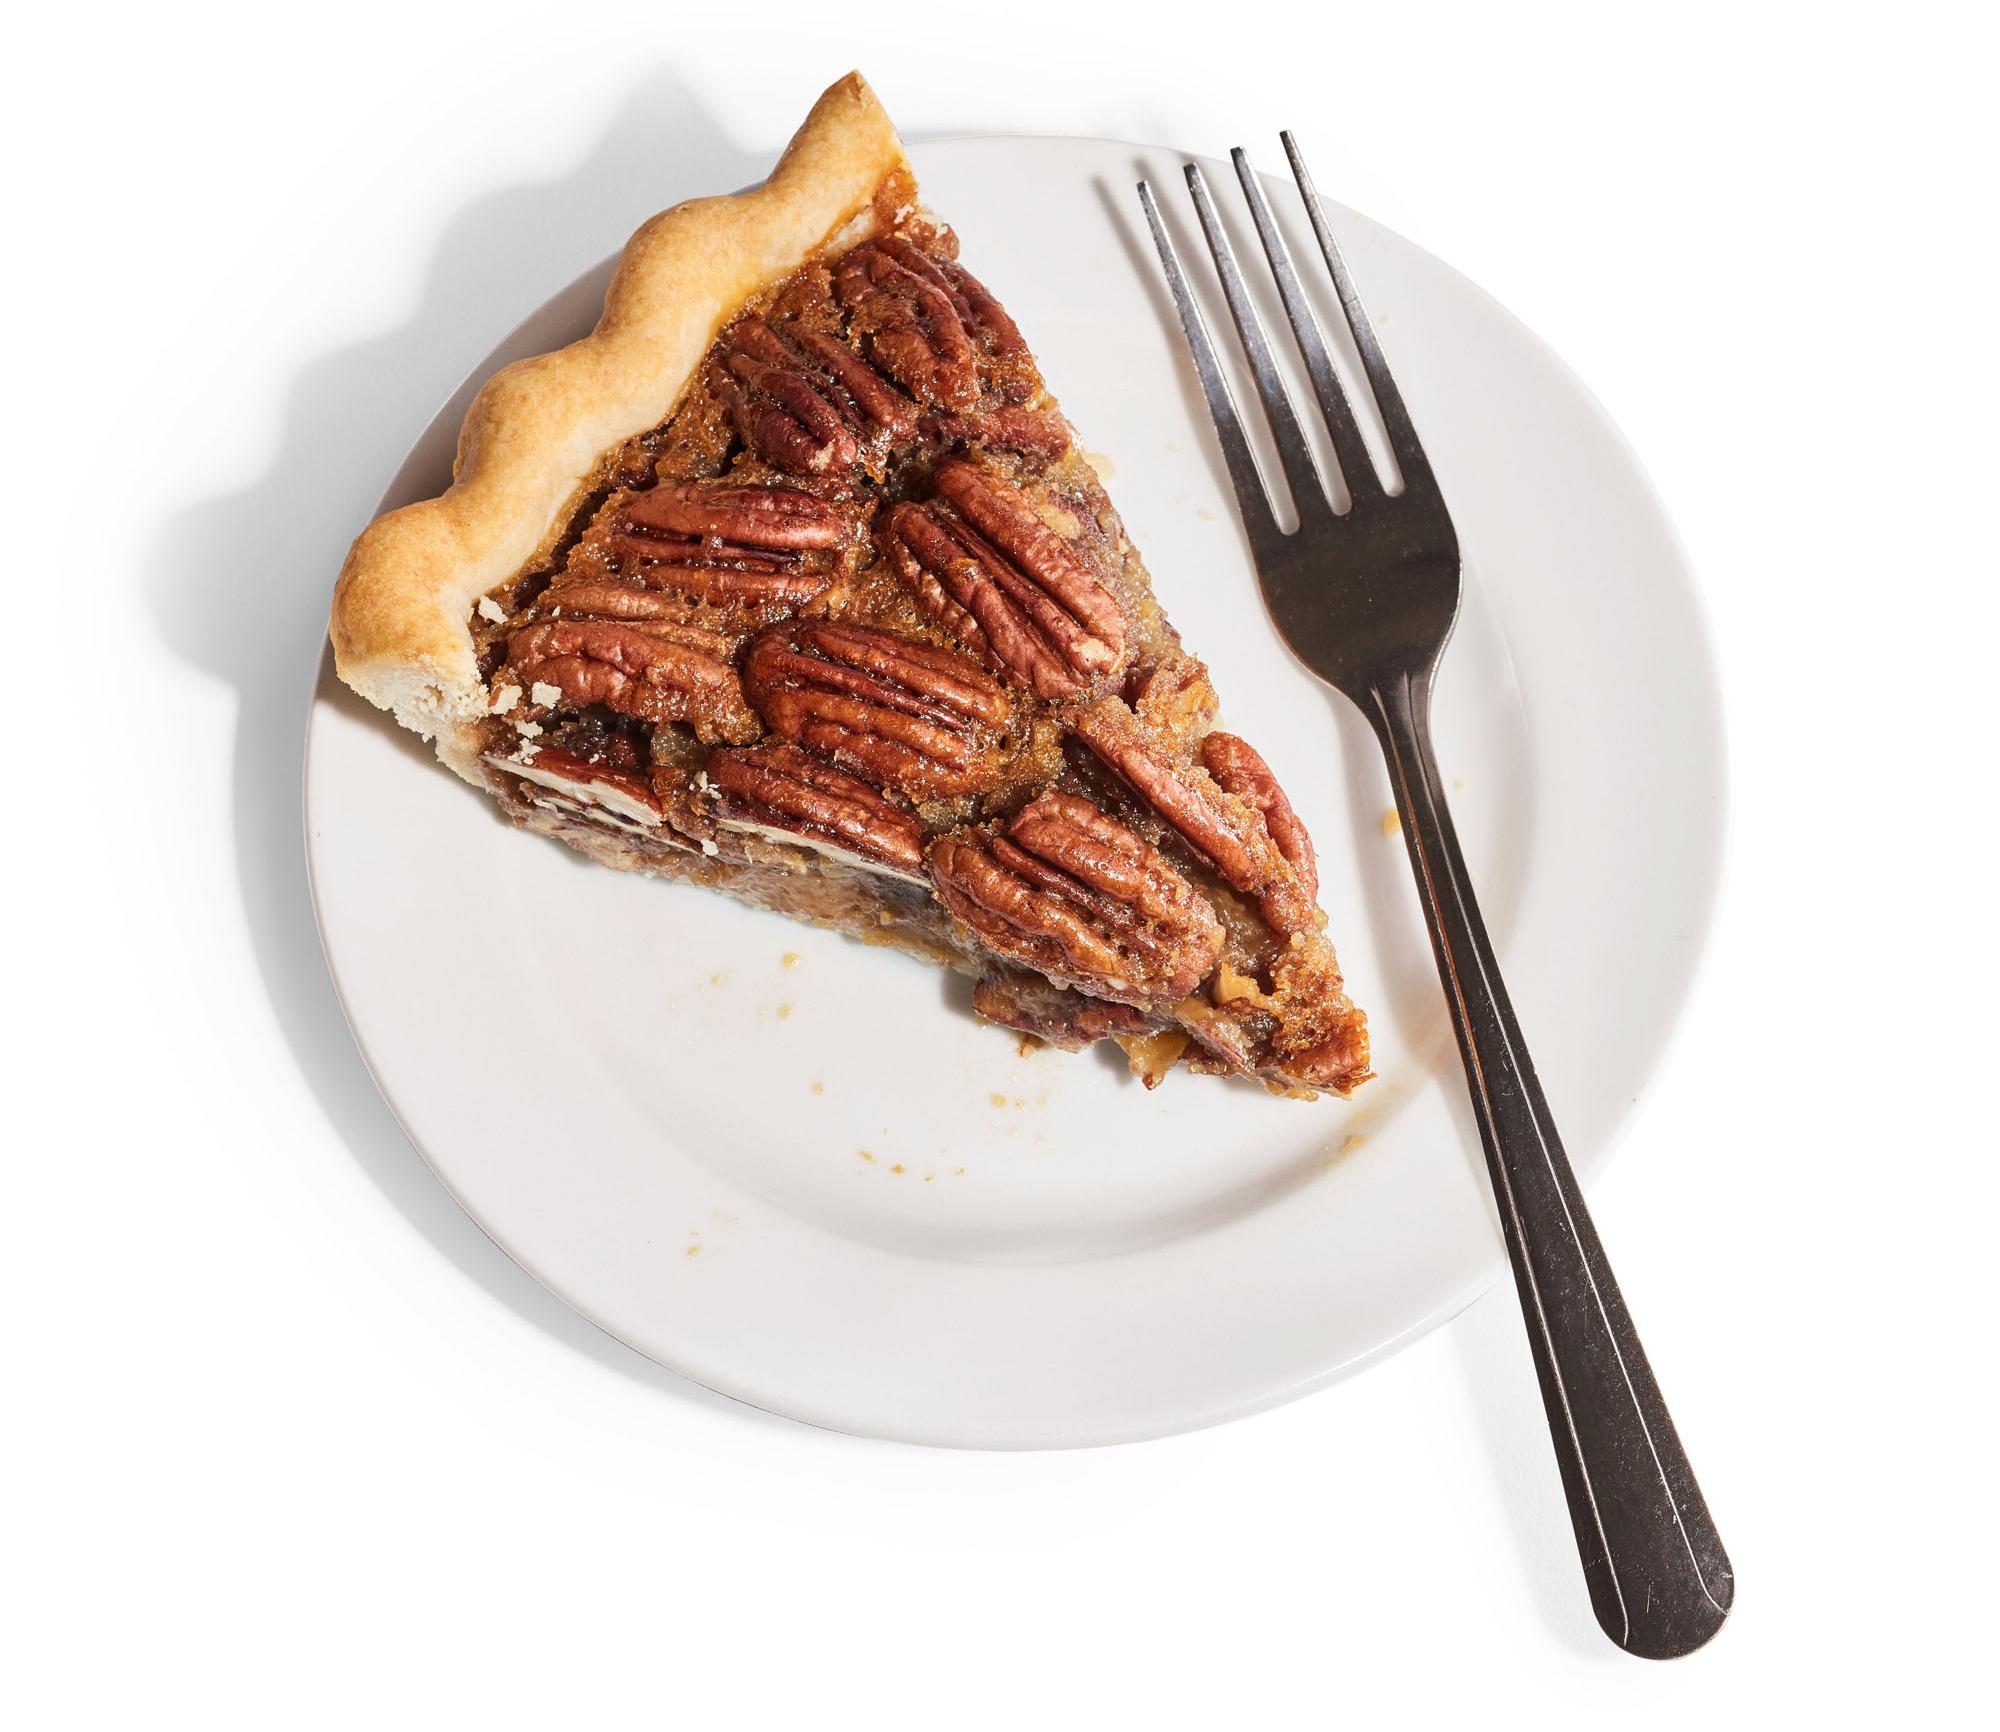 pecan pie on plate